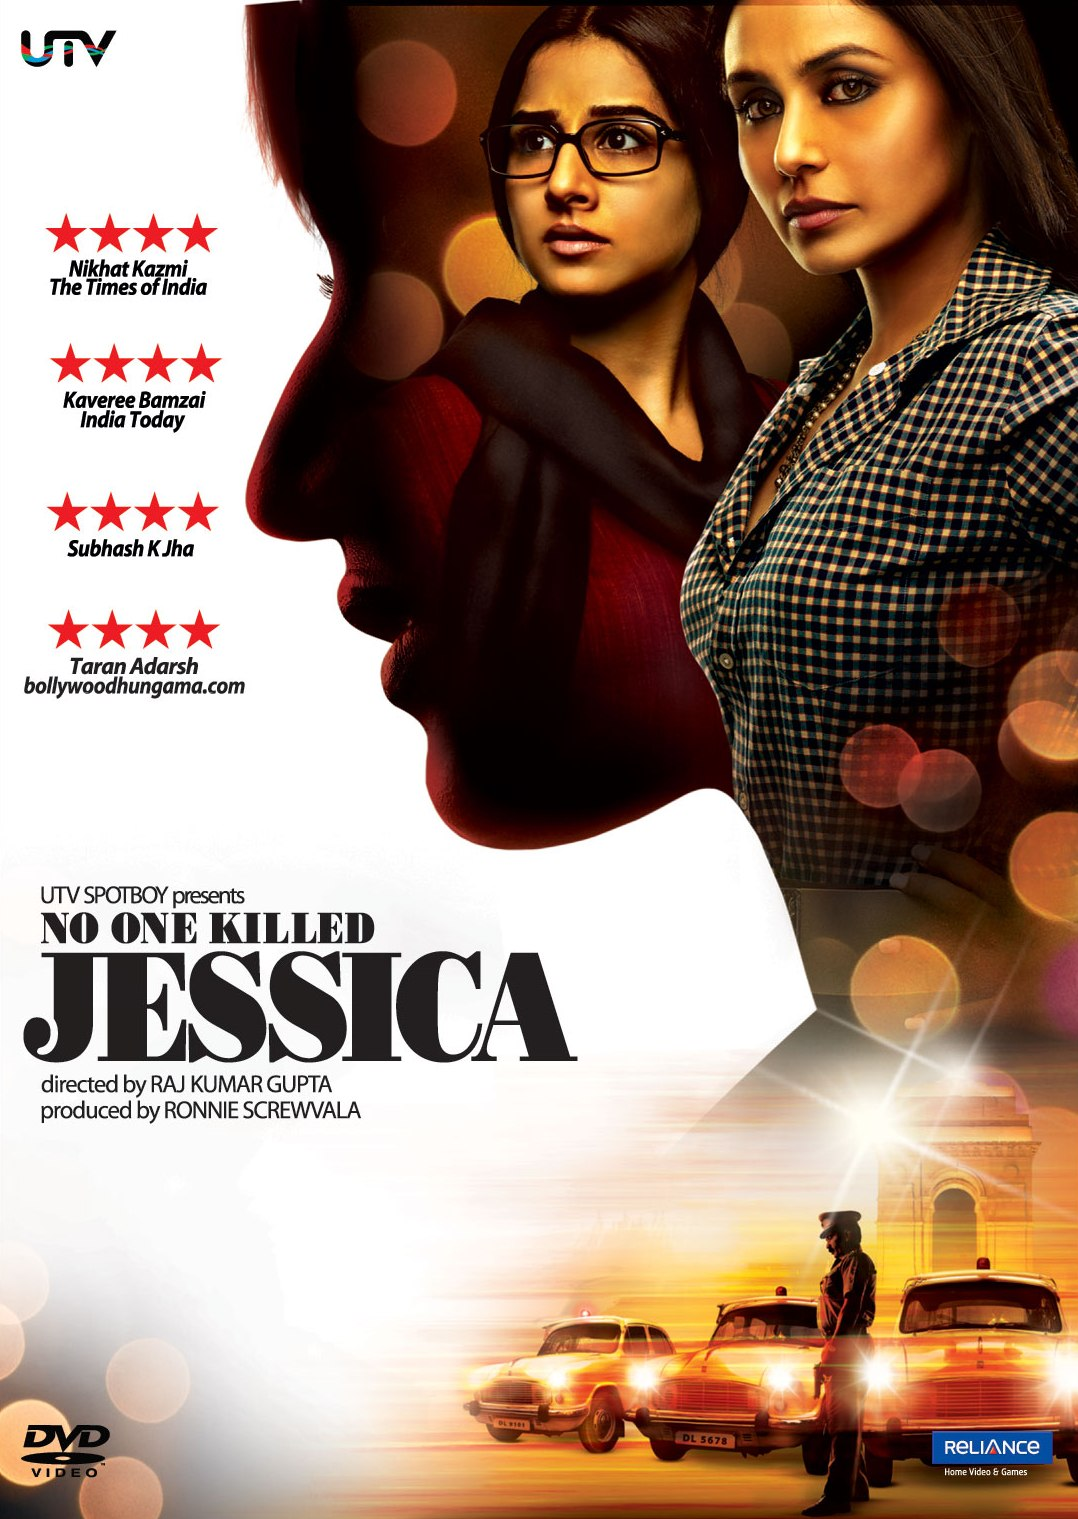 No-One-Killed-Jessica---DVD-Slipcase1.jpg